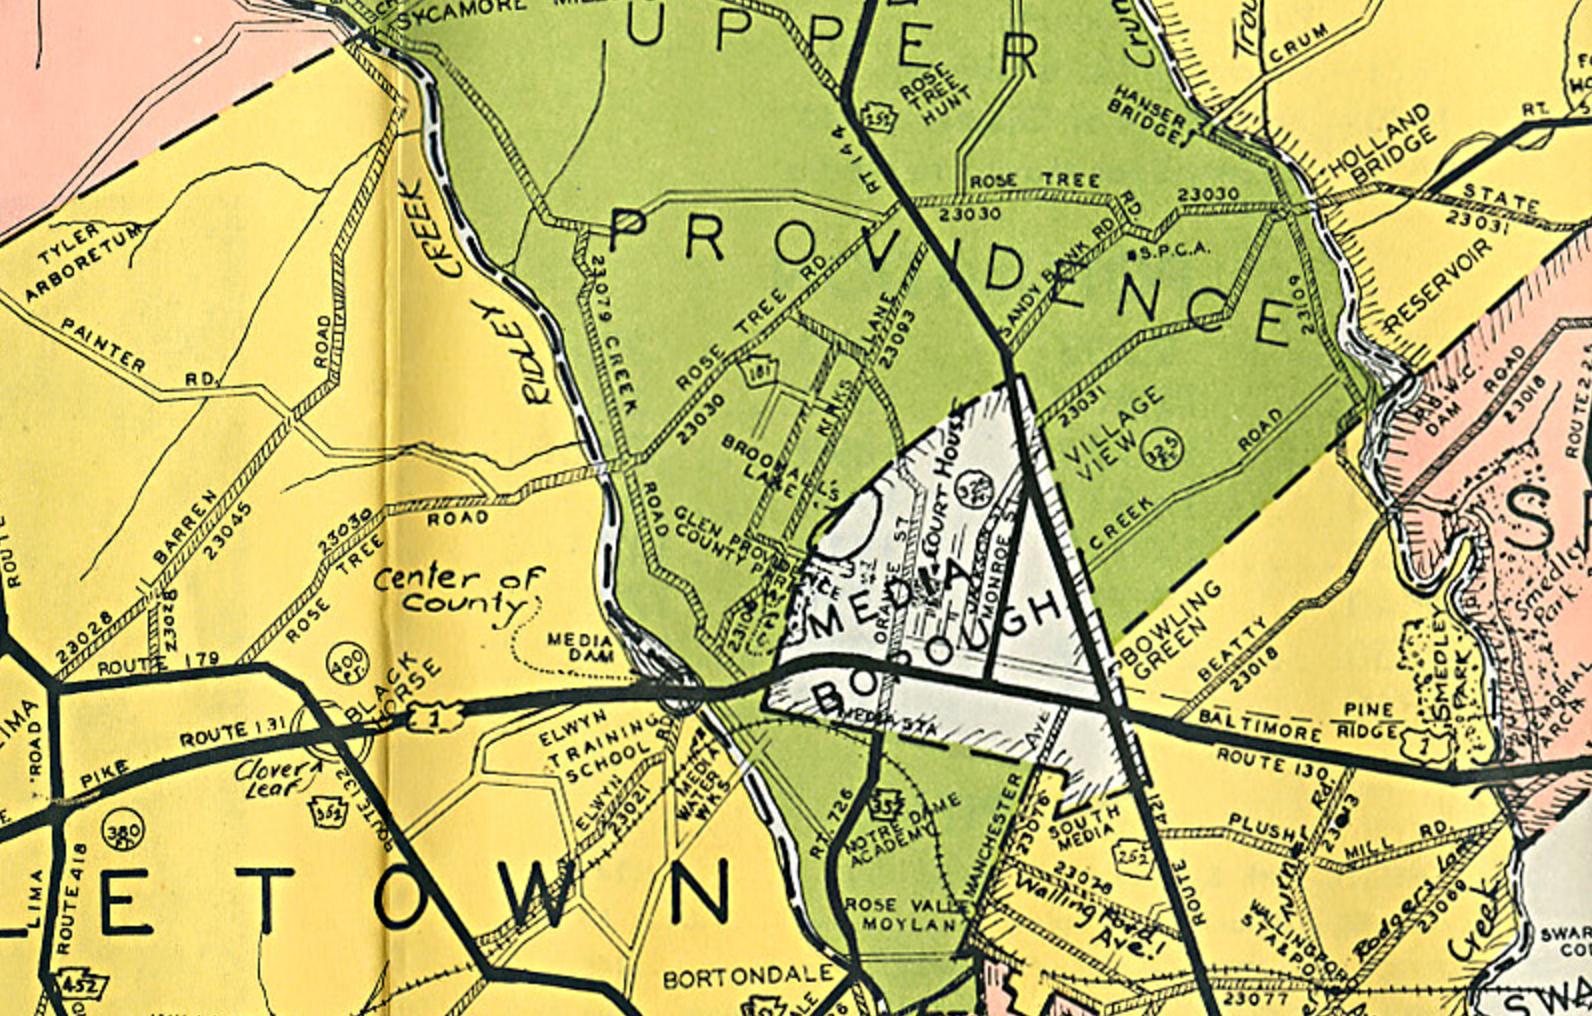 Historical Maps Friends Of Glen Providence Park - Road map of delaware